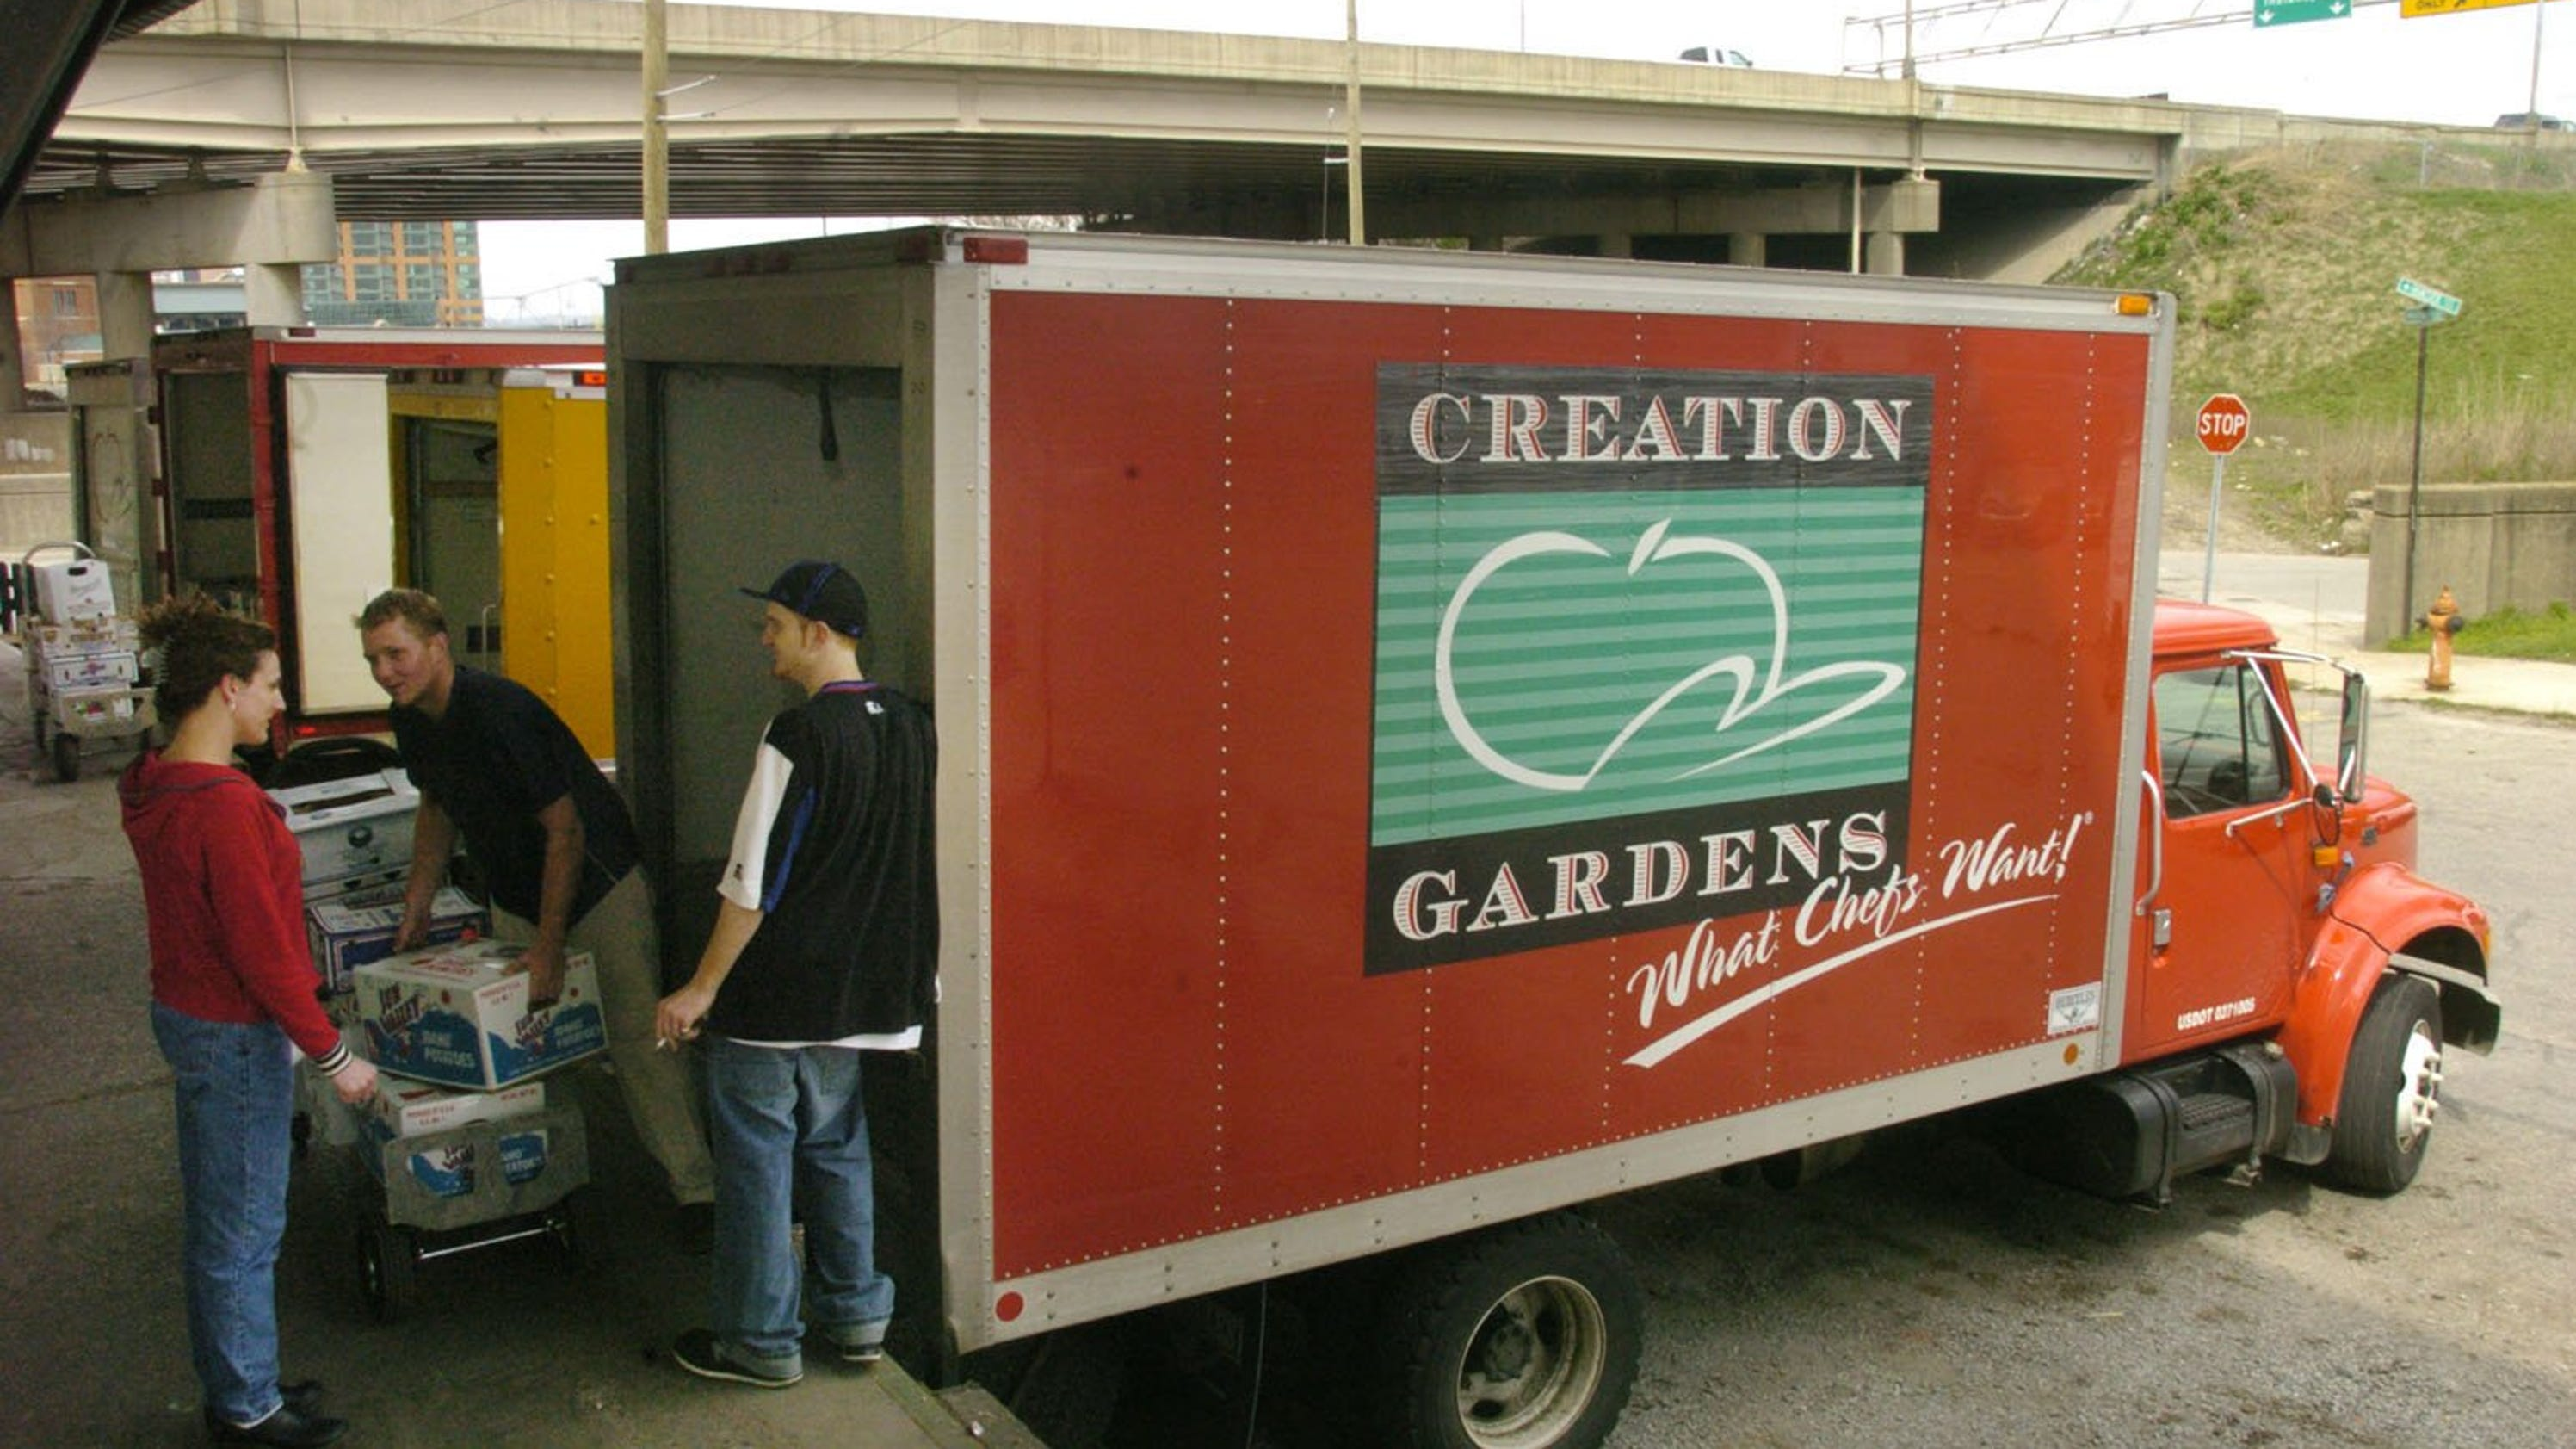 Butchery Fresh From Creation Gardens Nashville Lifestyles